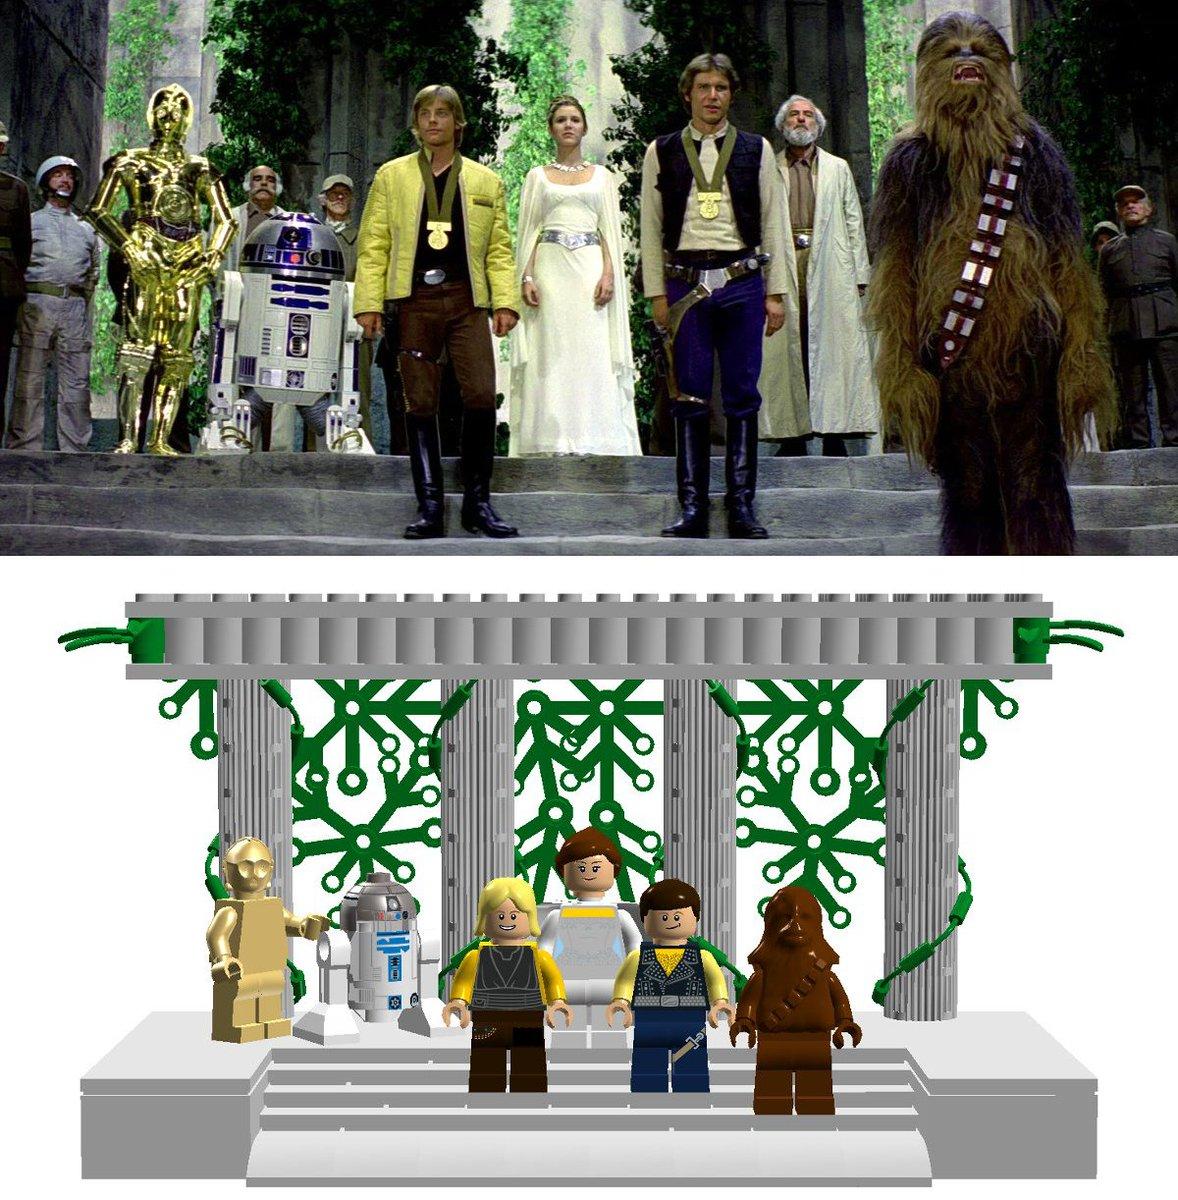 PLEASE VOTE for and RETWEET mach81&#39;s project on @LEGOIdeas!  https:// ideas.lego.com/projects/16596 4?cmp=IdeasProjectSocialShare &nbsp; …  #lego #legoideas #hansolo #princessleia<br>http://pic.twitter.com/IdWZjH4lRp